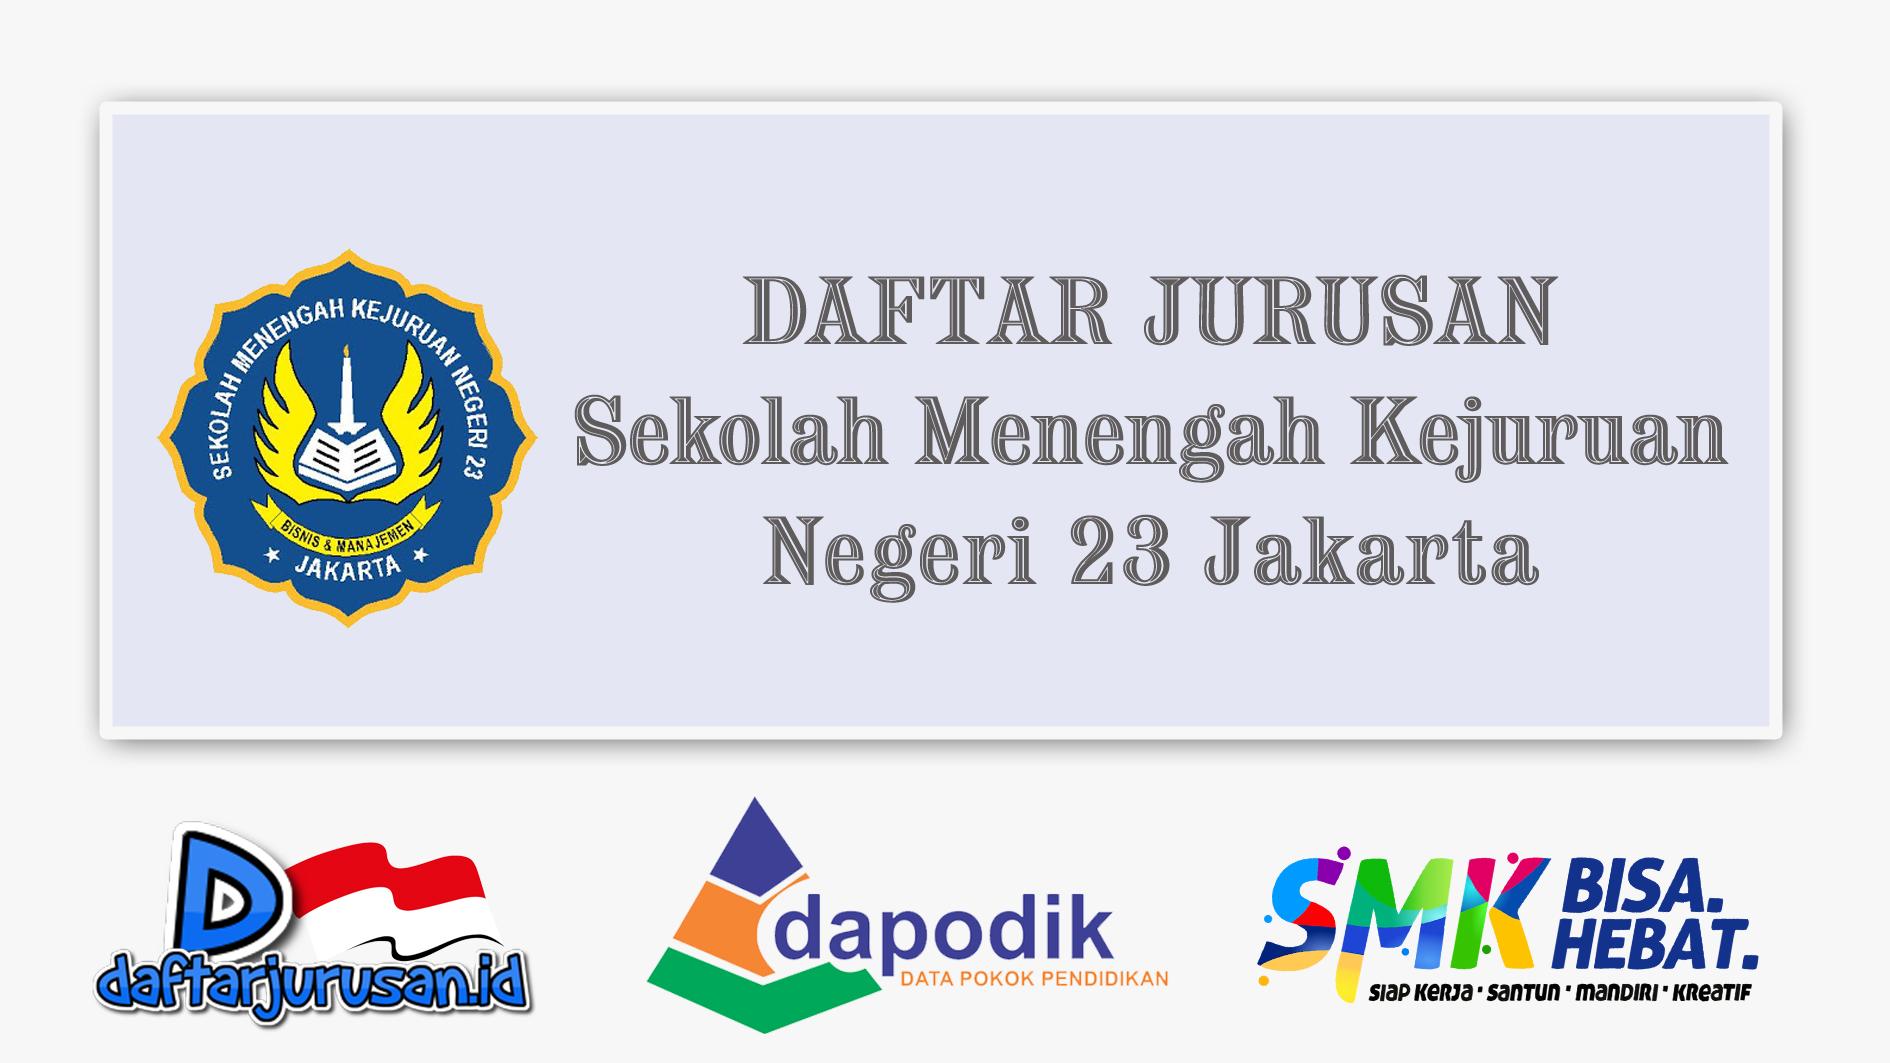 Daftar Jurusan SMK Negeri 23 Jakarta Utara